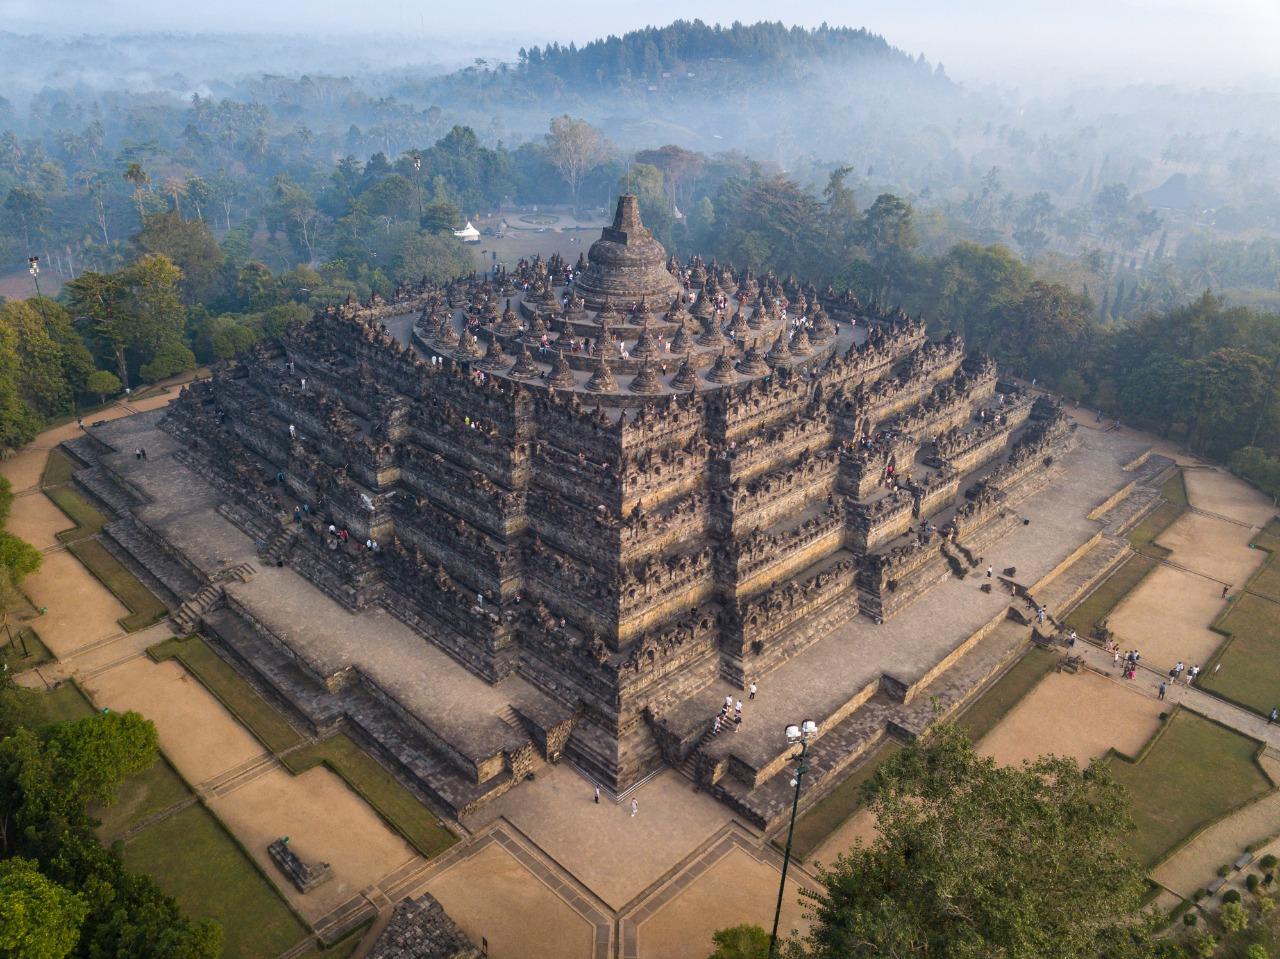 Pemandangan Candi Borobudur | Shutterstock/Adel Newman